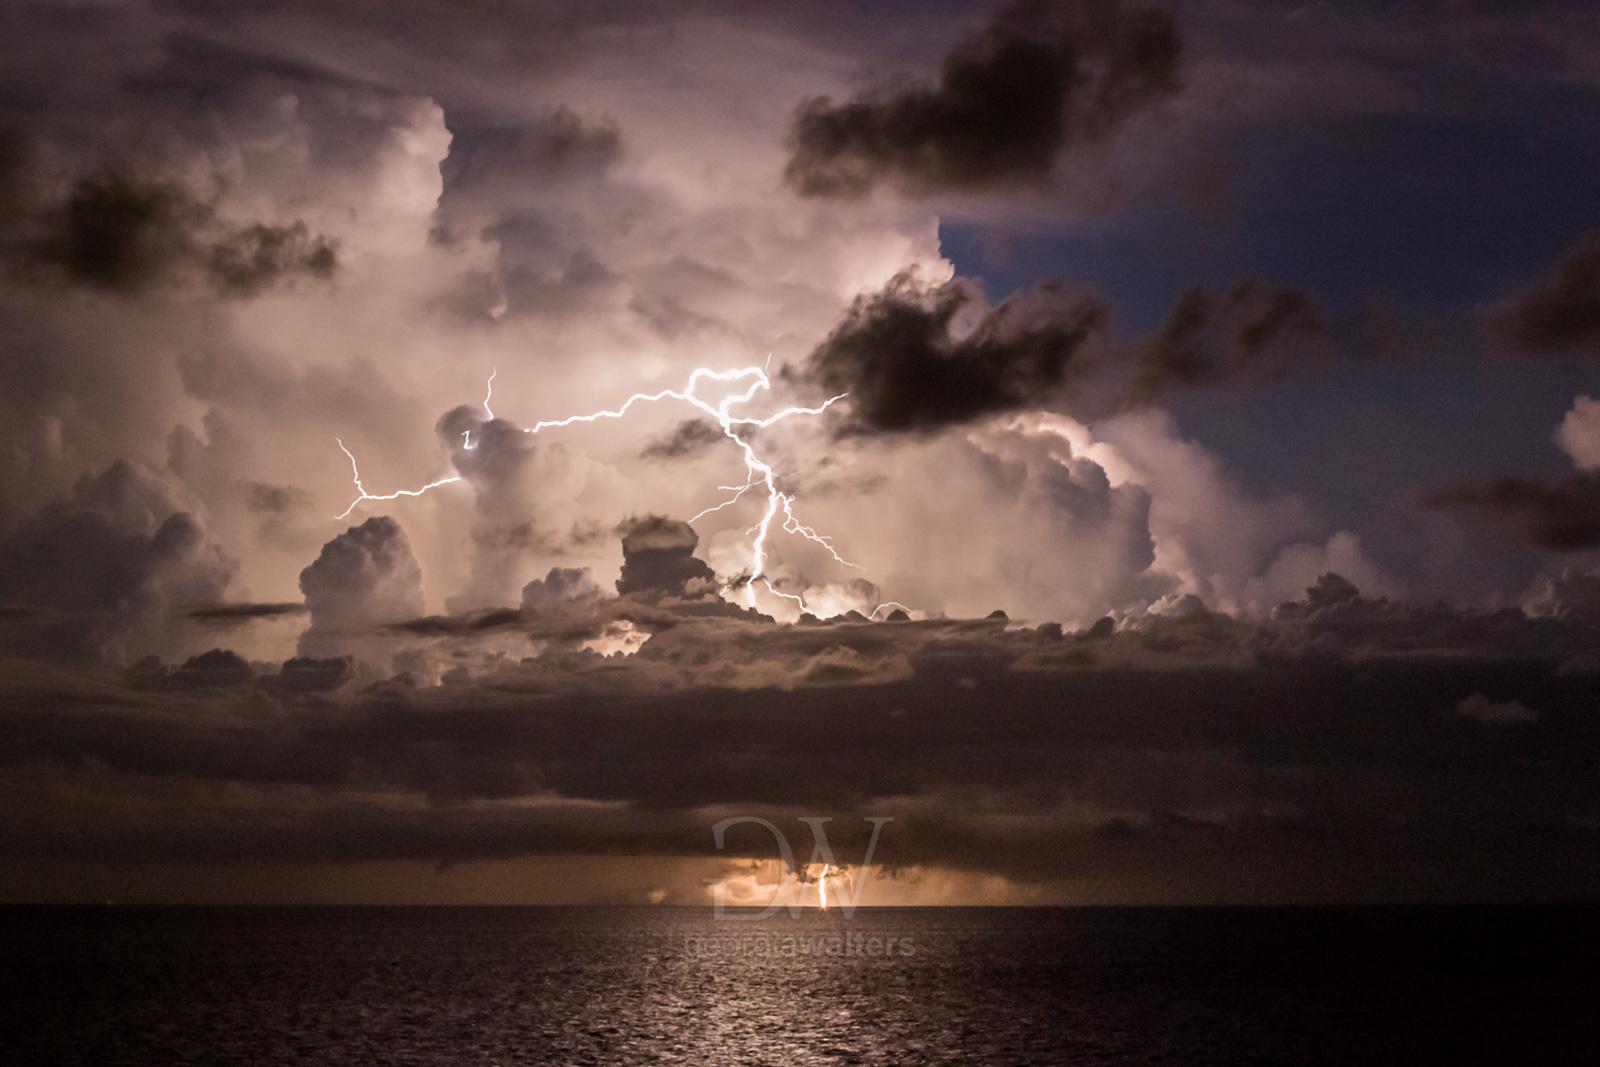 Storm rages over the ocean